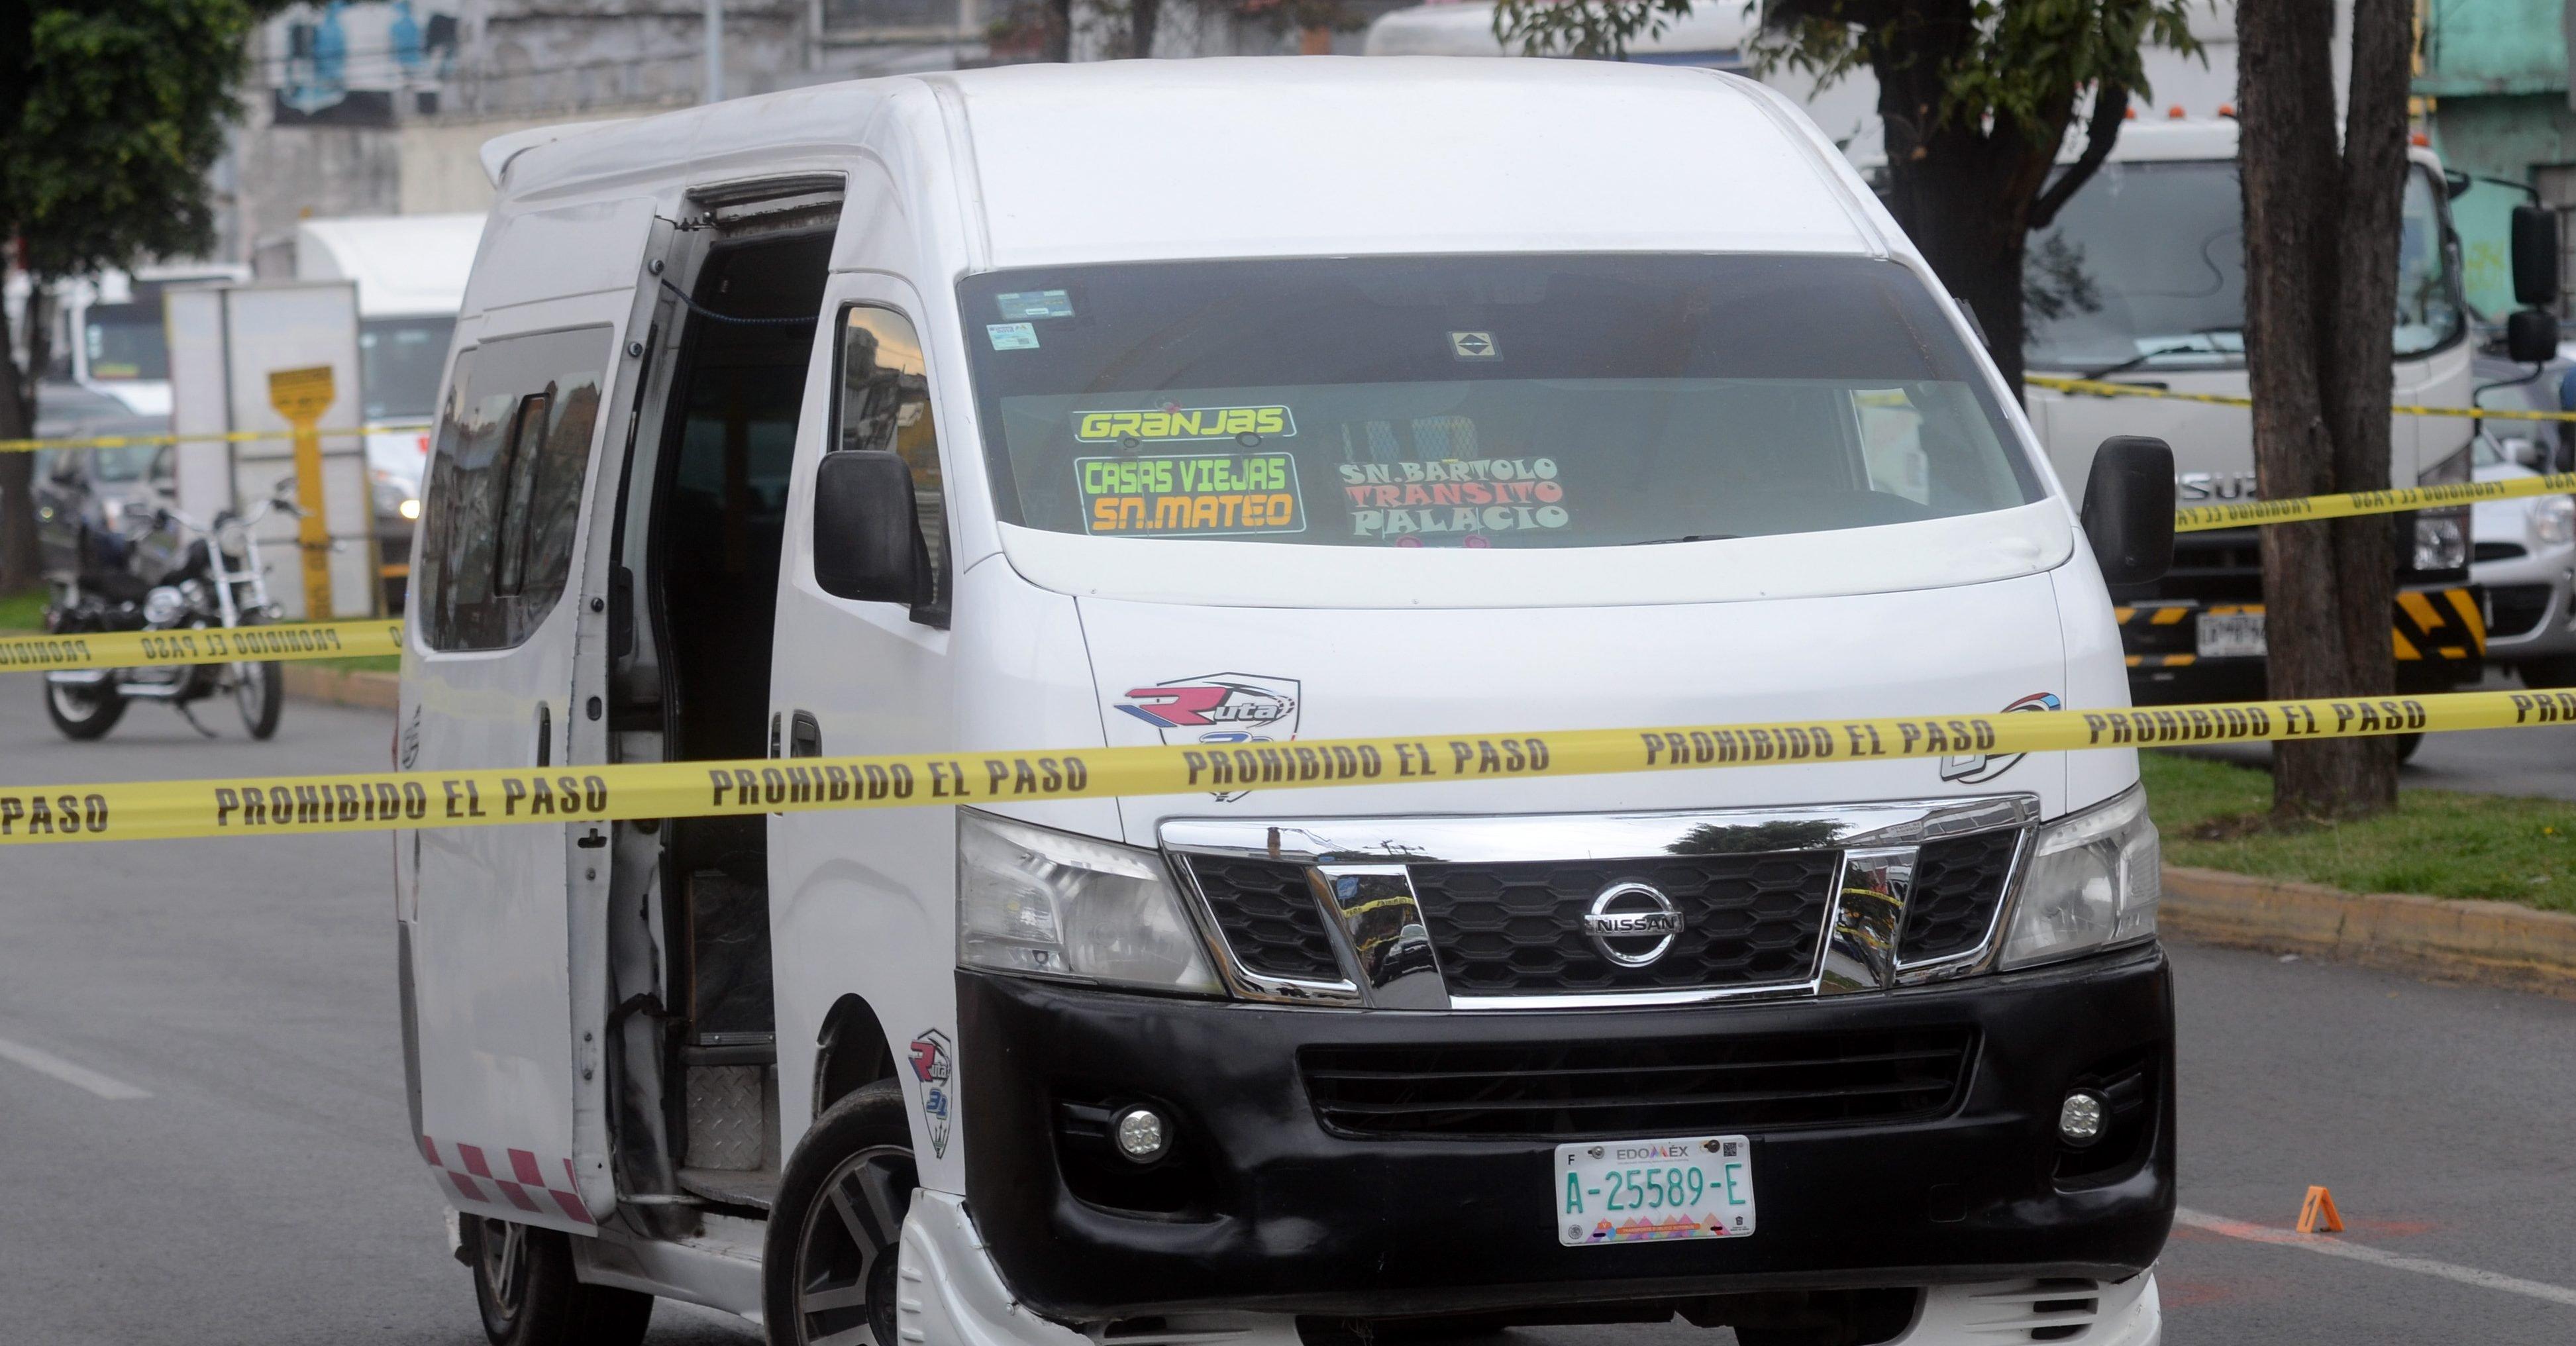 CONGRESO MEXIQUENSE BUSCA TIPIFICAR EL ROBO AL TRANSPORTE PÚBLICO COMO UN DELITO GRAVE